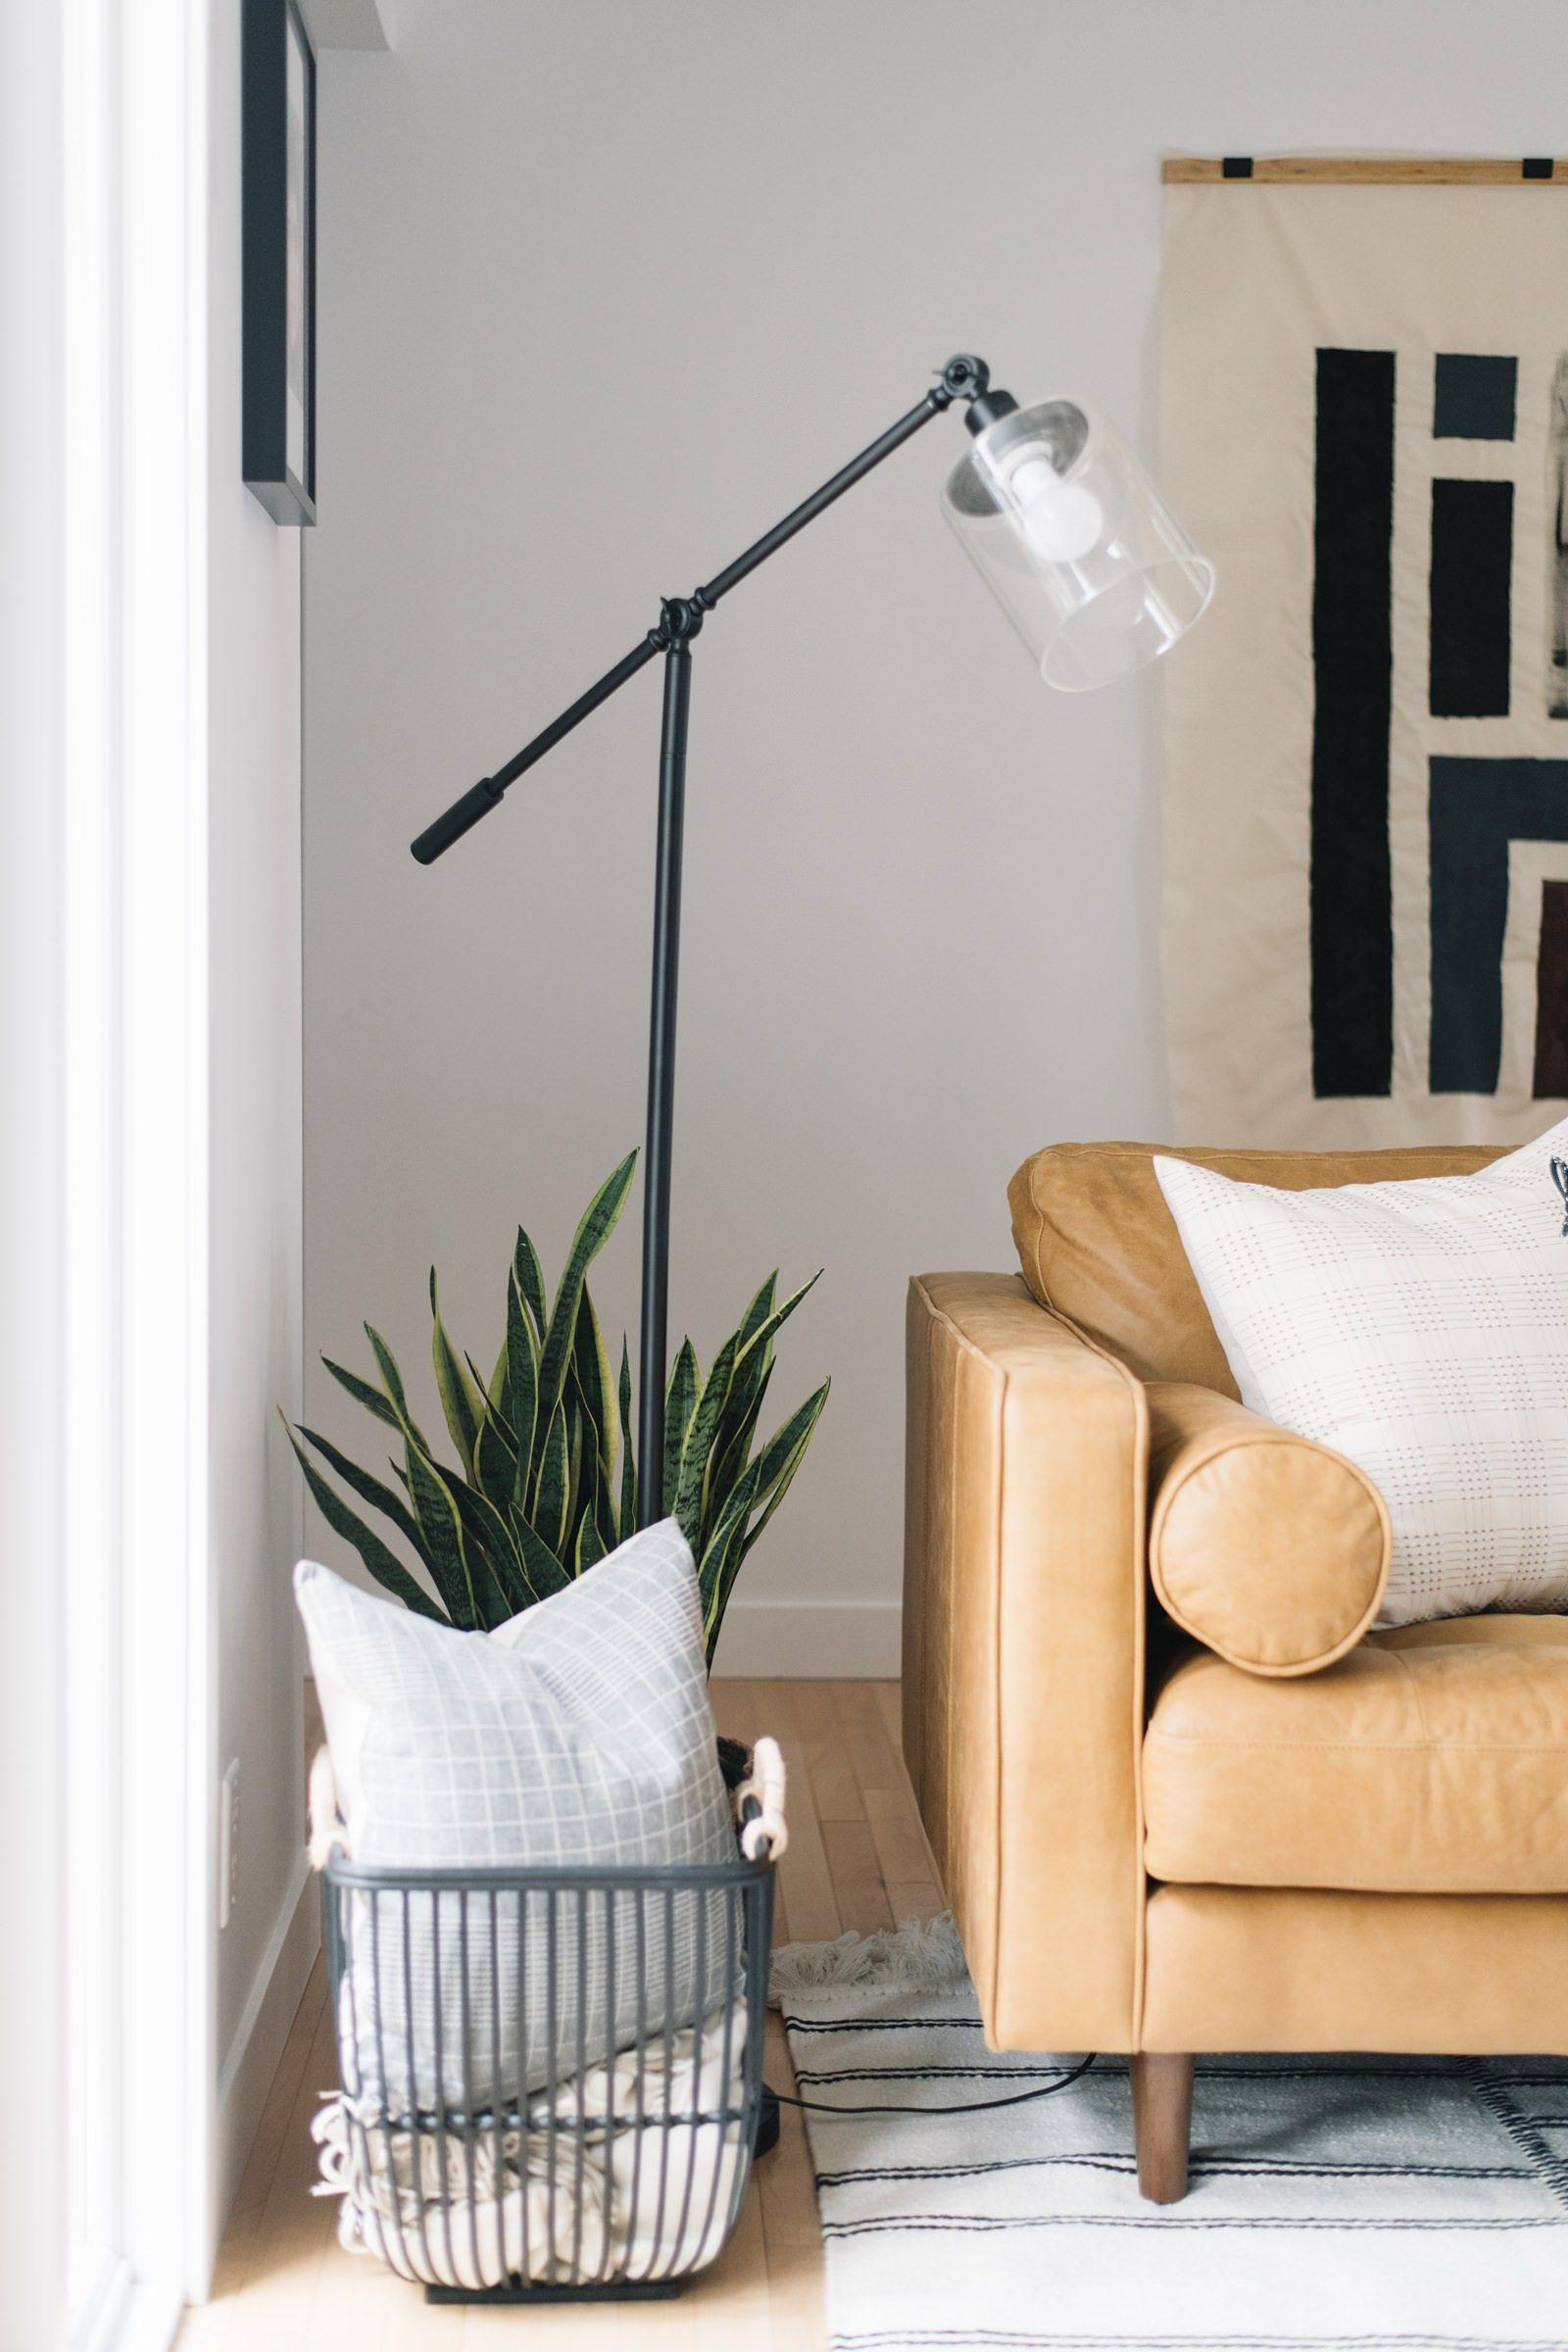 Scandinavian Modern Home Tracey Jazmin Interior Photographer In 2020 Interior Design Photography Store Design Interior Modern Homewares